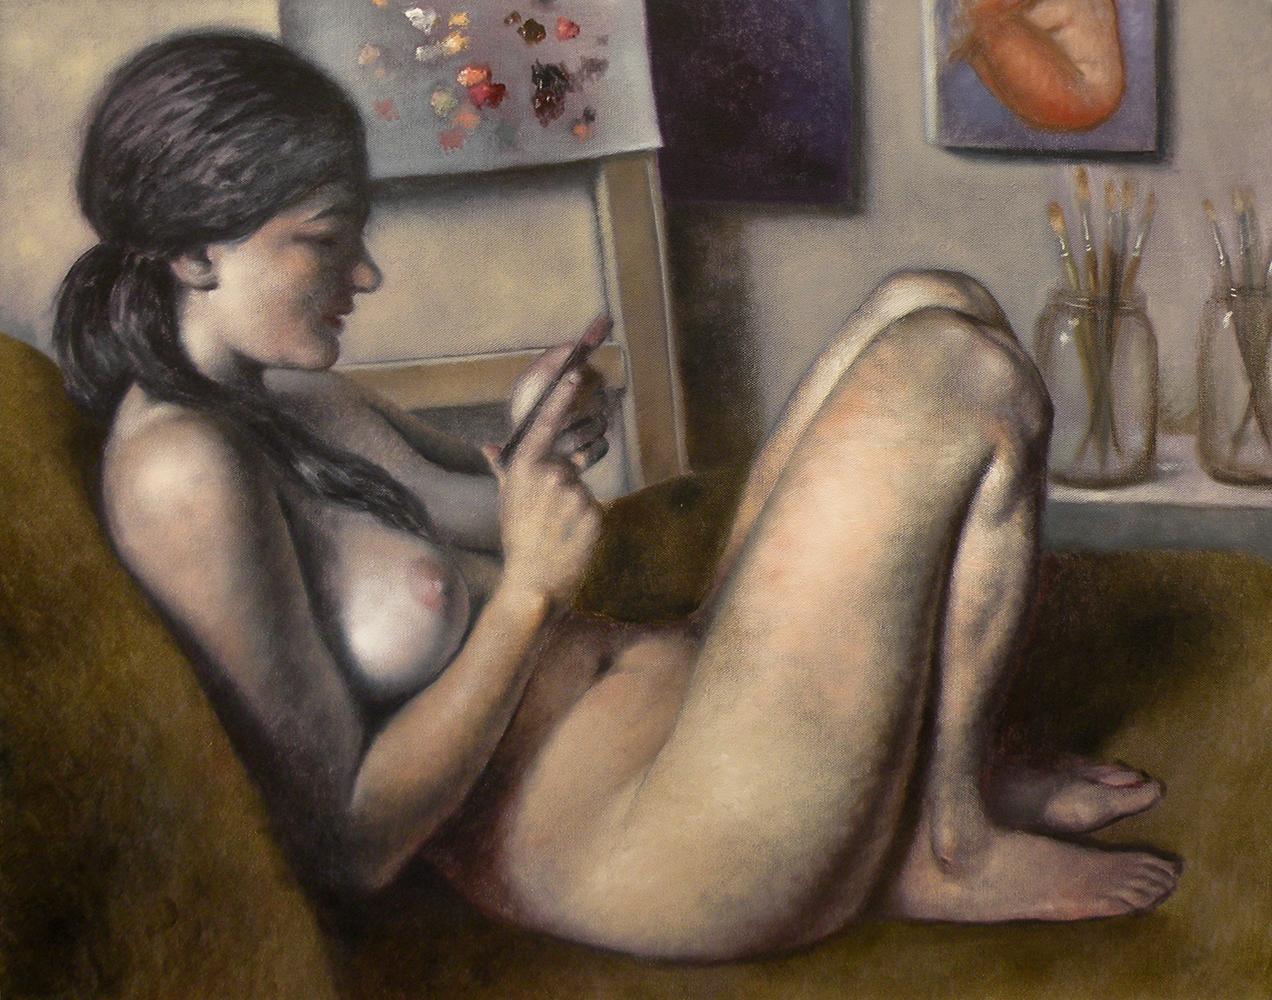 1. MAIDMAN_Leah-Checking-Her-Cell-Phone-2_24x30.JPG